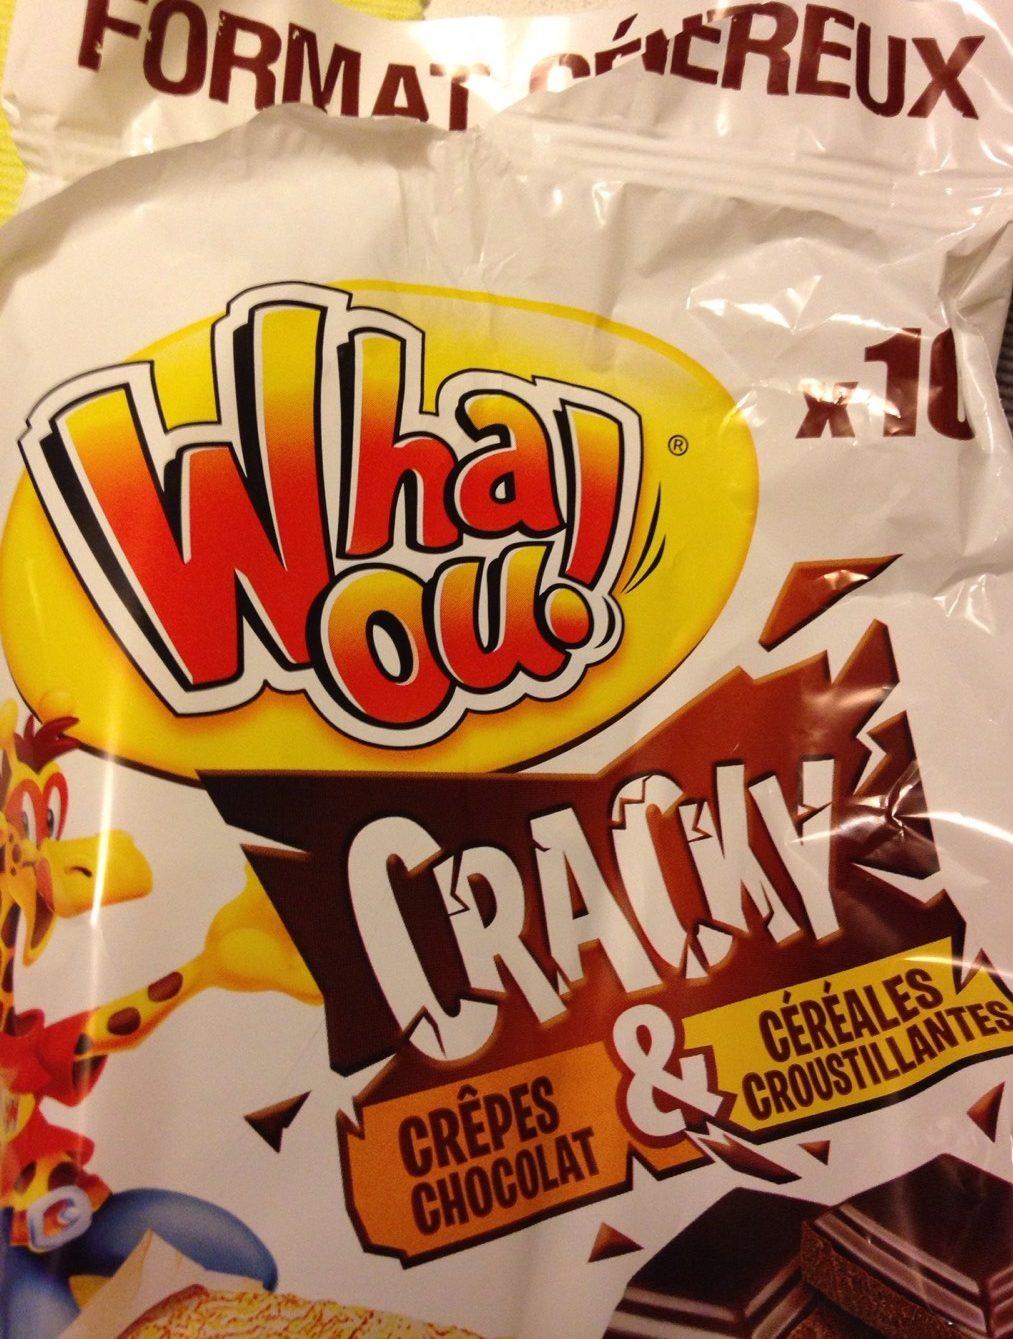 Crêpes Whaou! CRACKY - Product